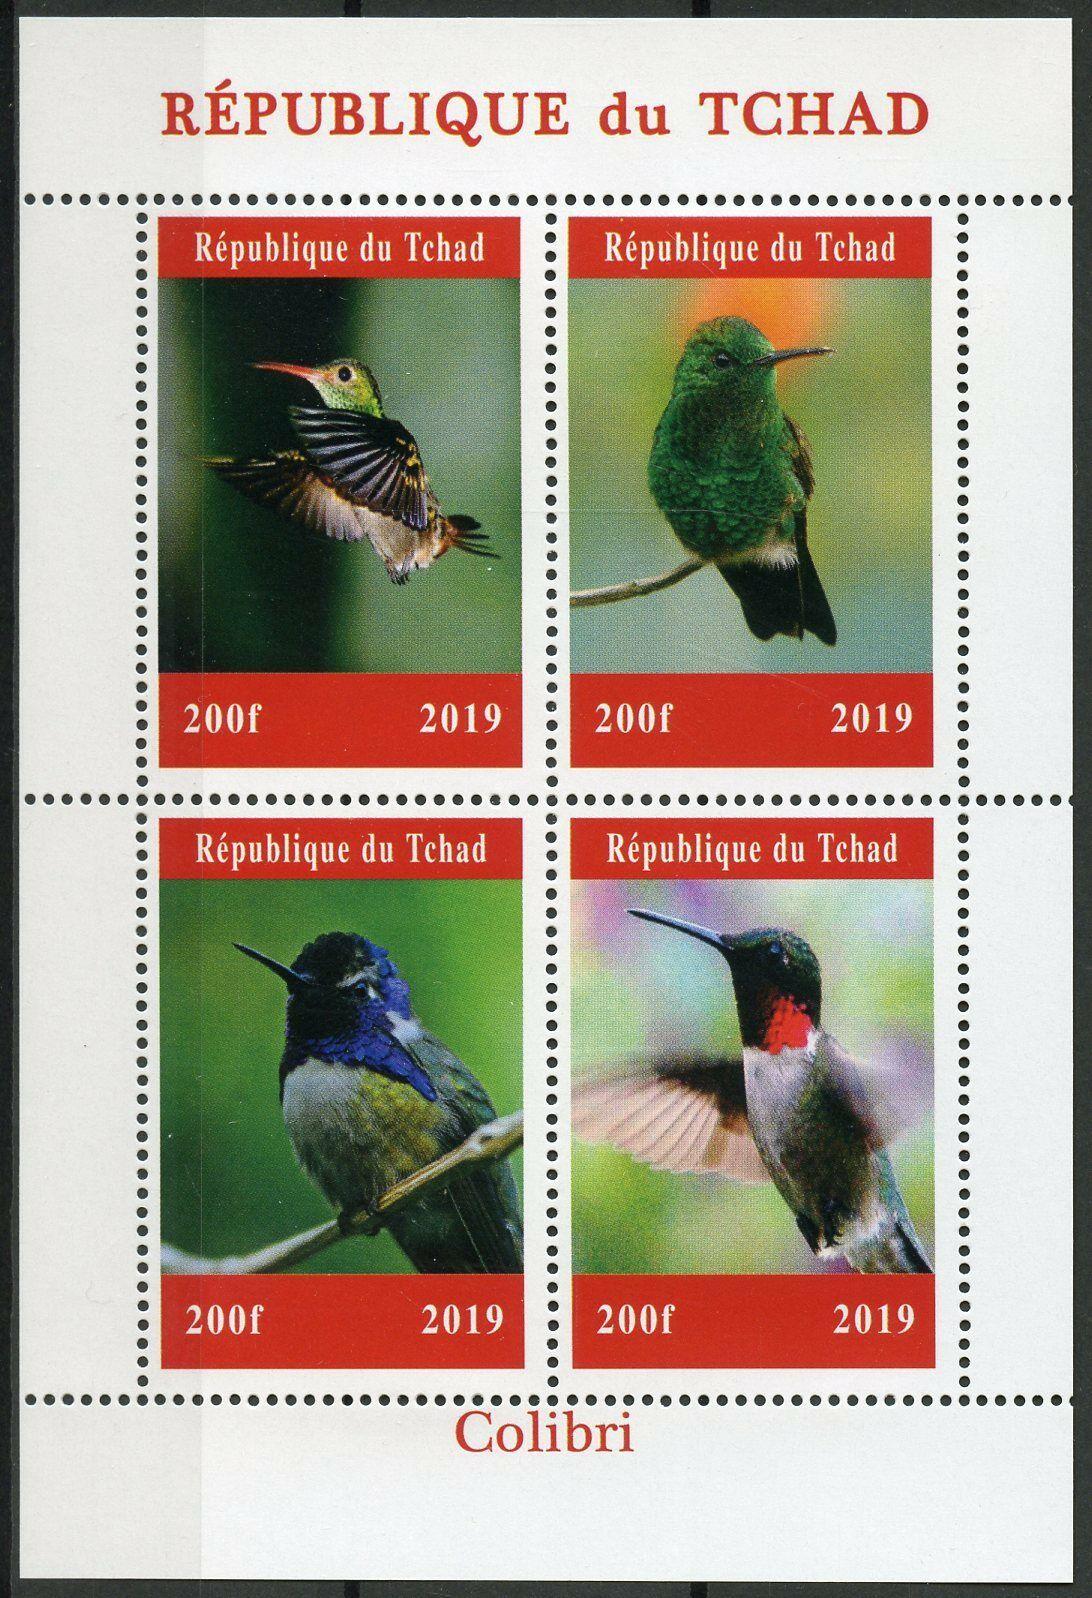 Republic of Chad - Hummingbirds (January 1, 2019) sheet of 4